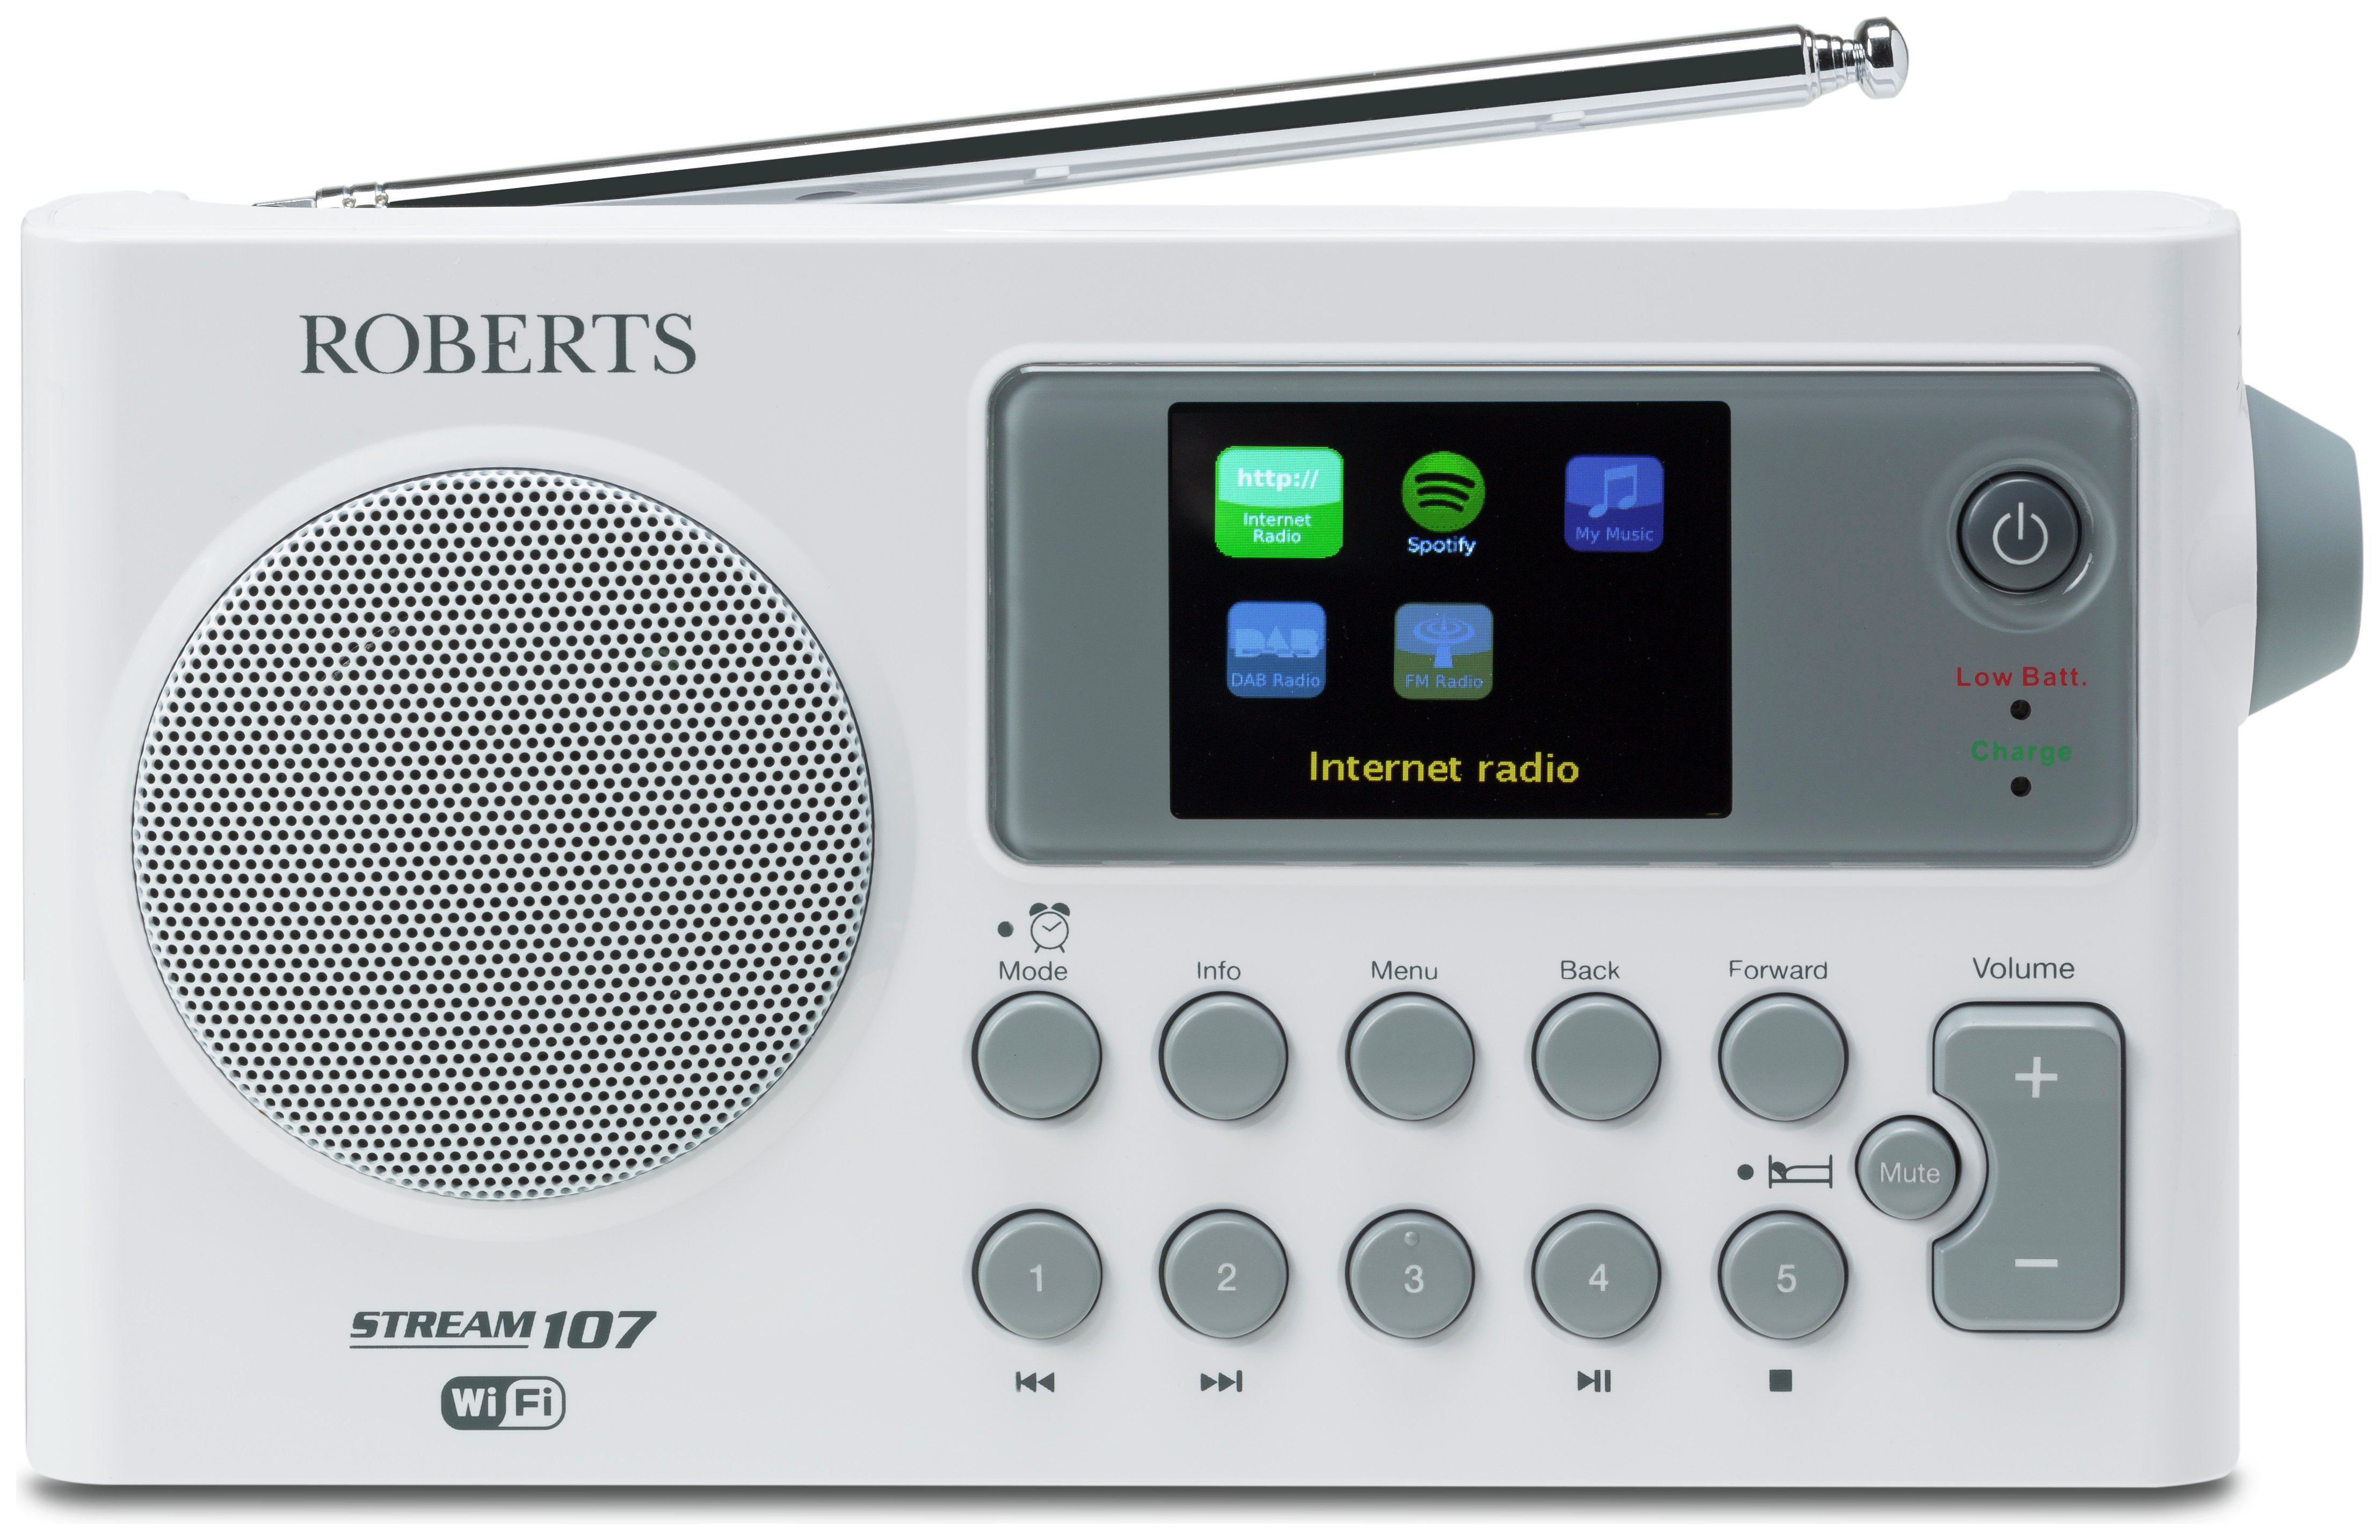 Image of Roberts - Radio Stream107 Internet Radio